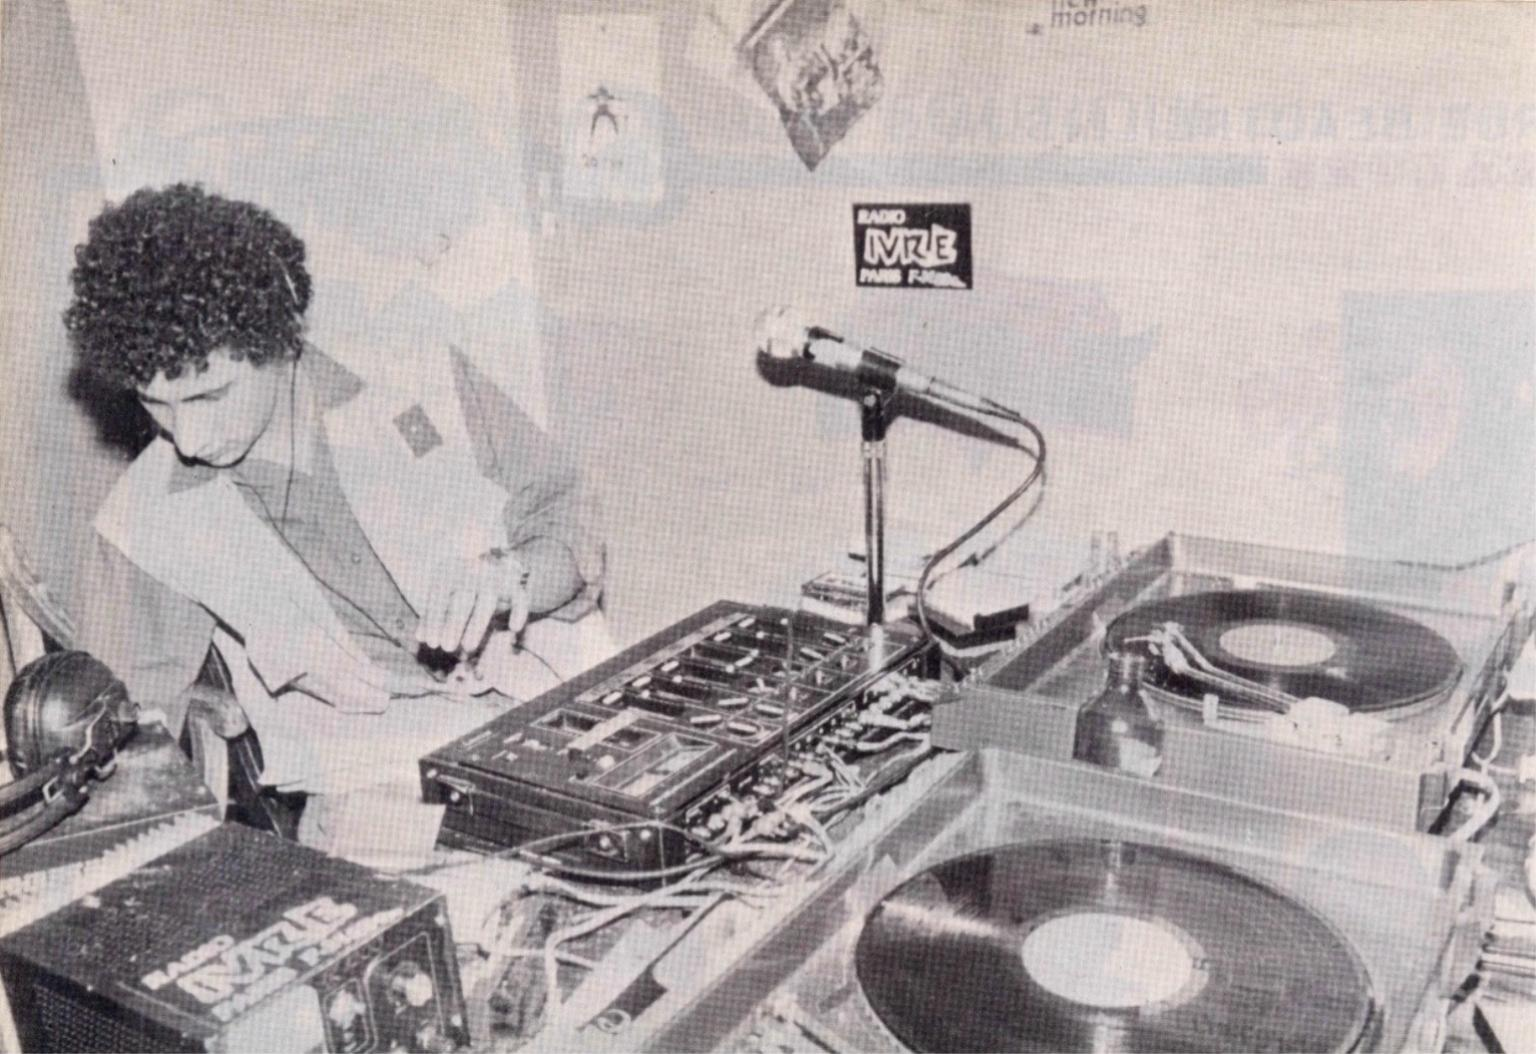 GBD au micro de Radio Ivre 88.8